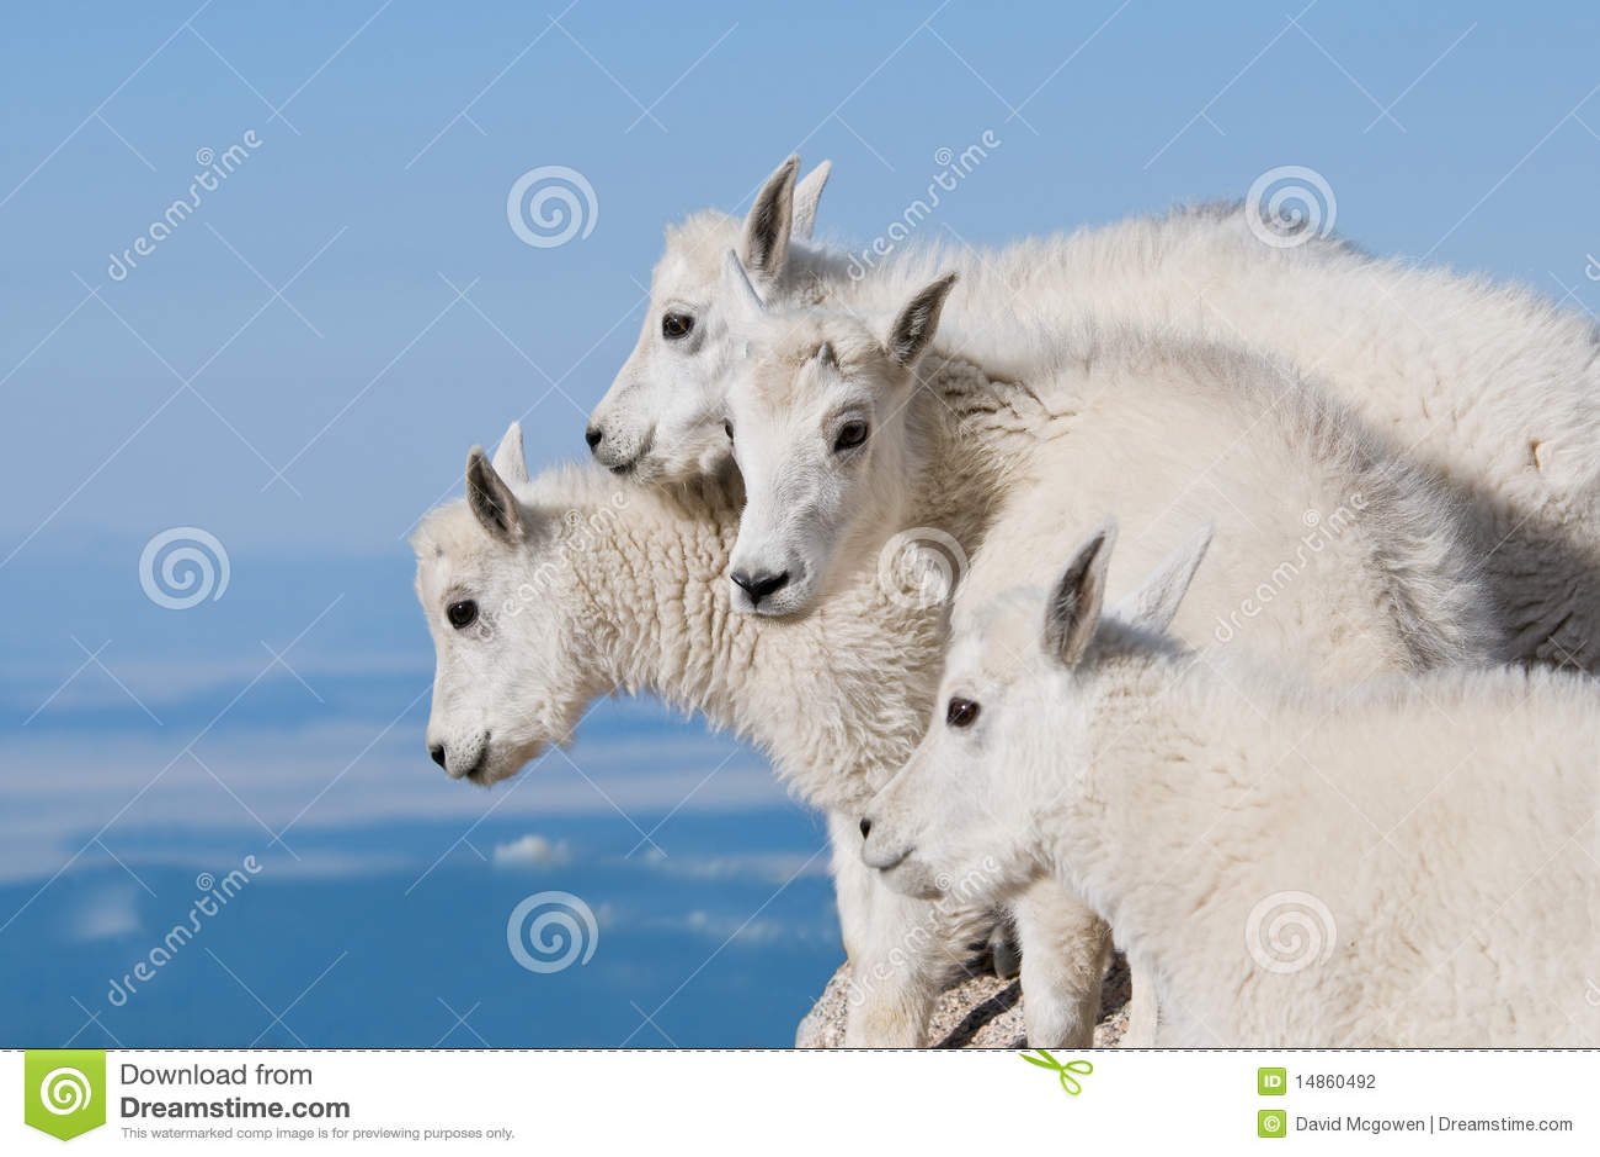 Baby Mountain Goats